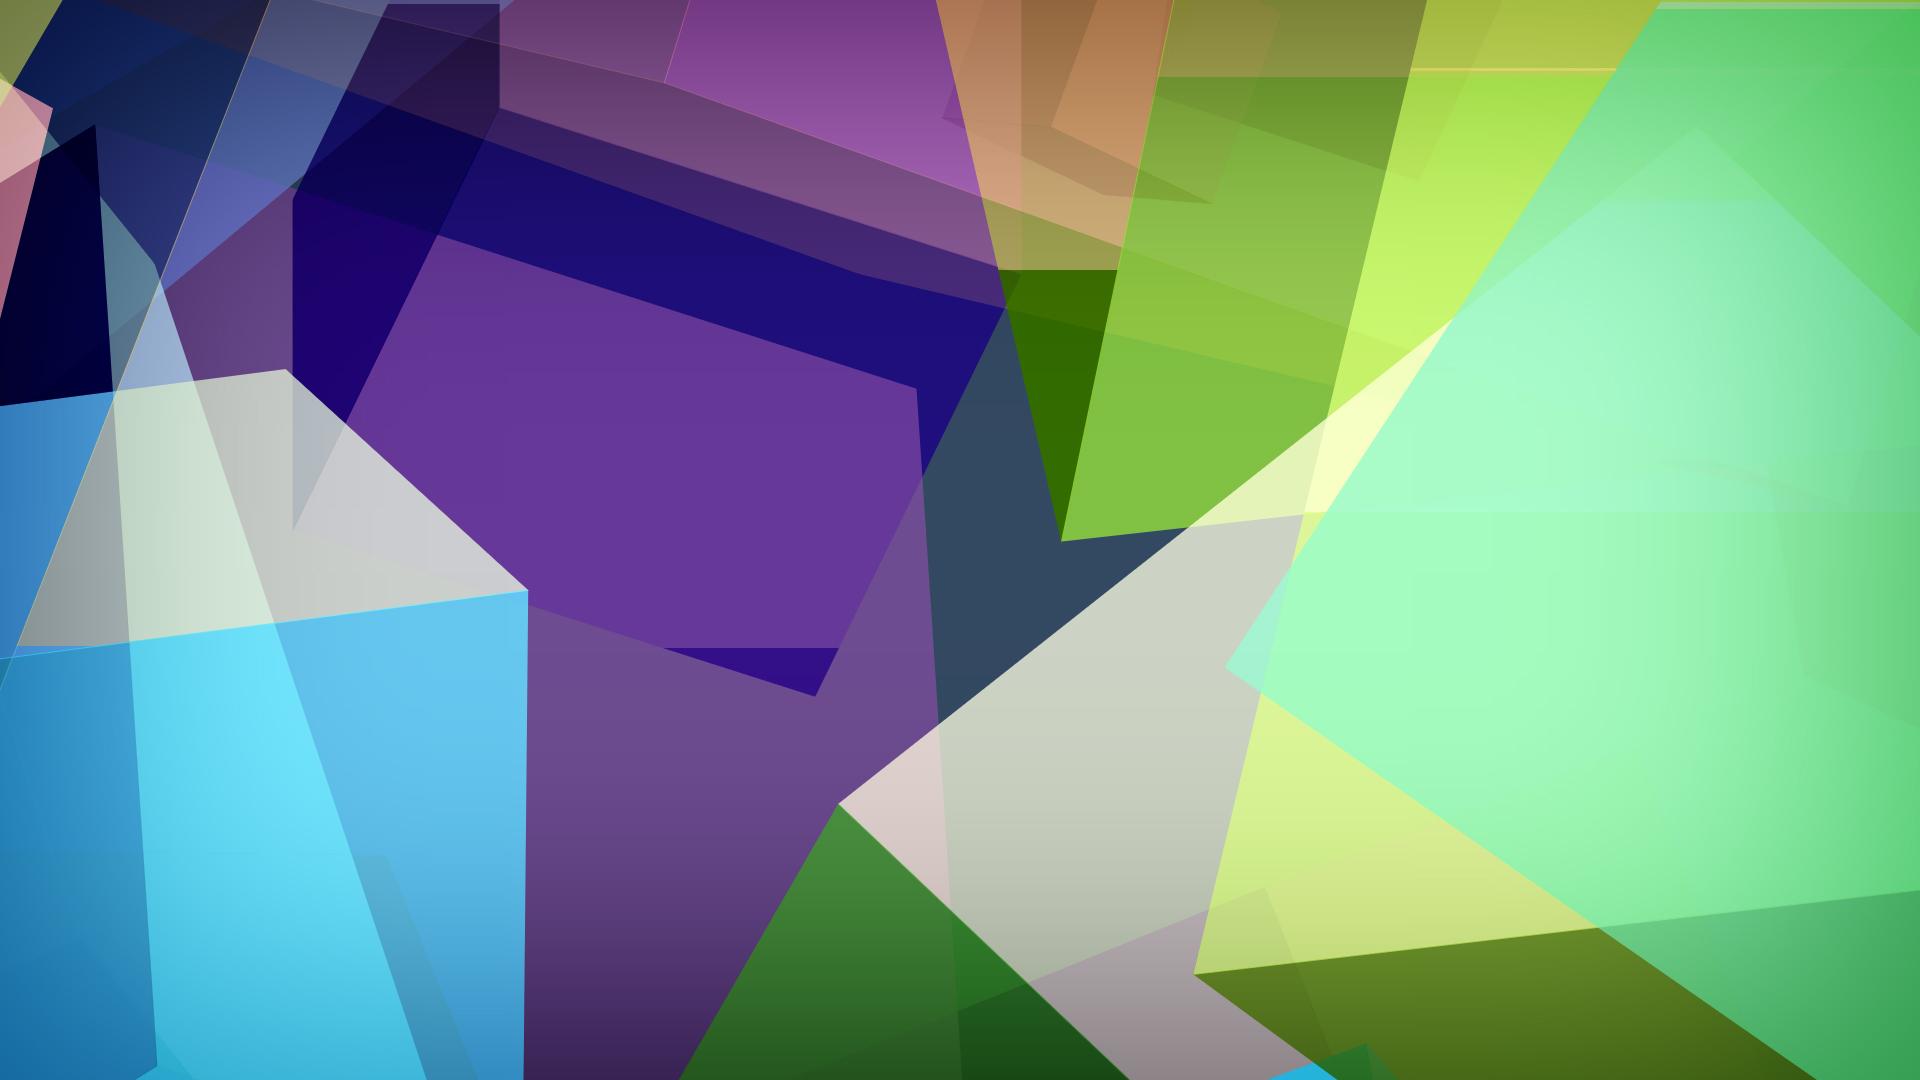 Abstract Cube Wallpaper Victoria Nece 1920x1080